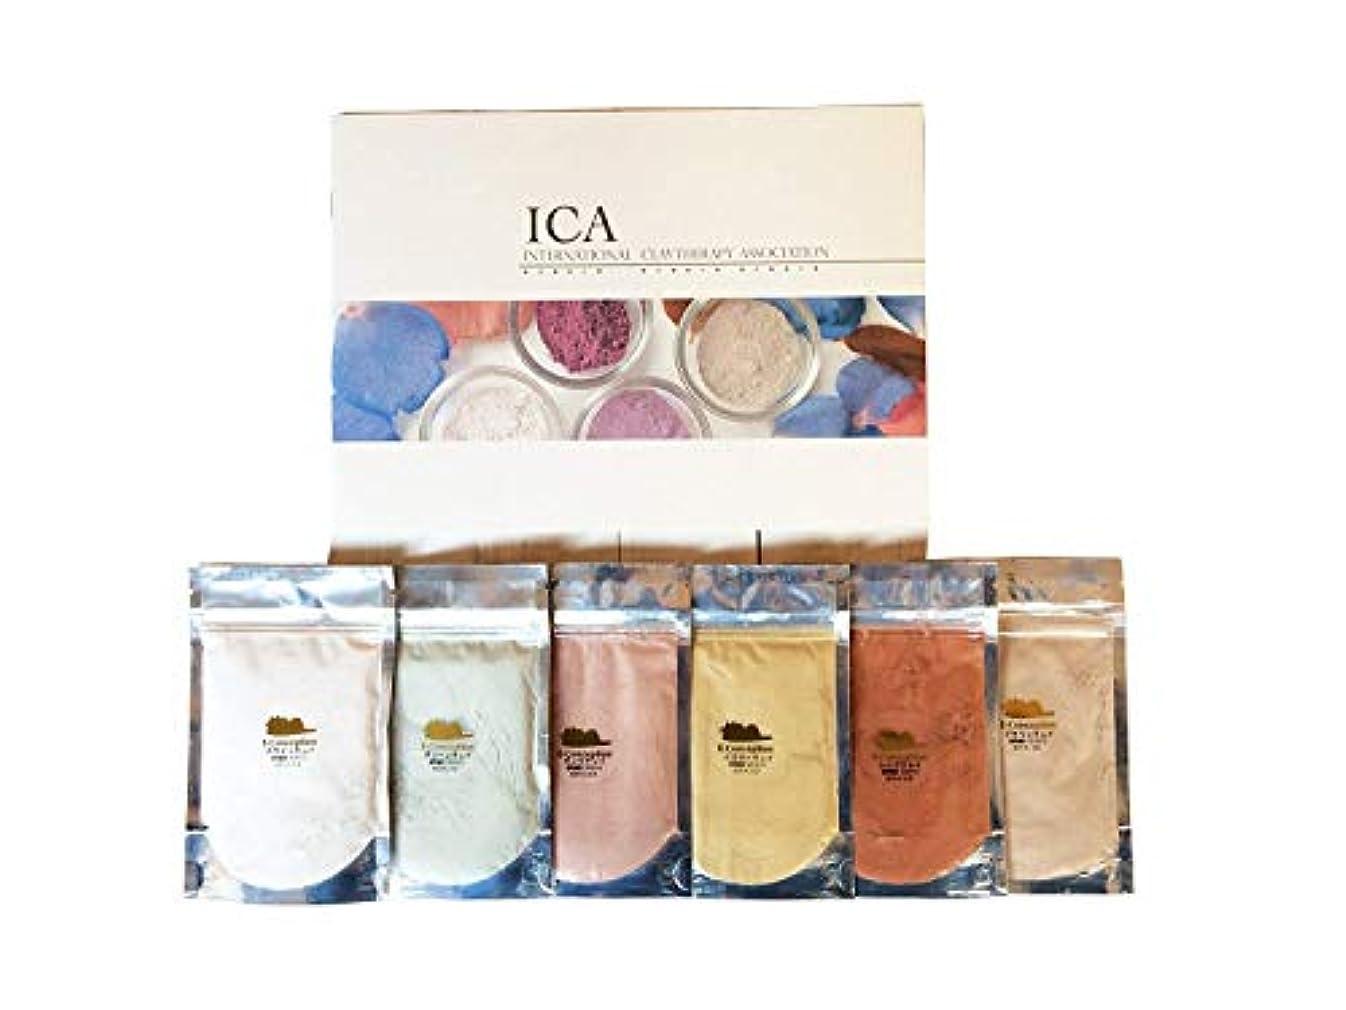 ICA国際クレイセラピー協会 【ヒーリングクレイ30g×6種ギフトセット】 (パンフレット付き)